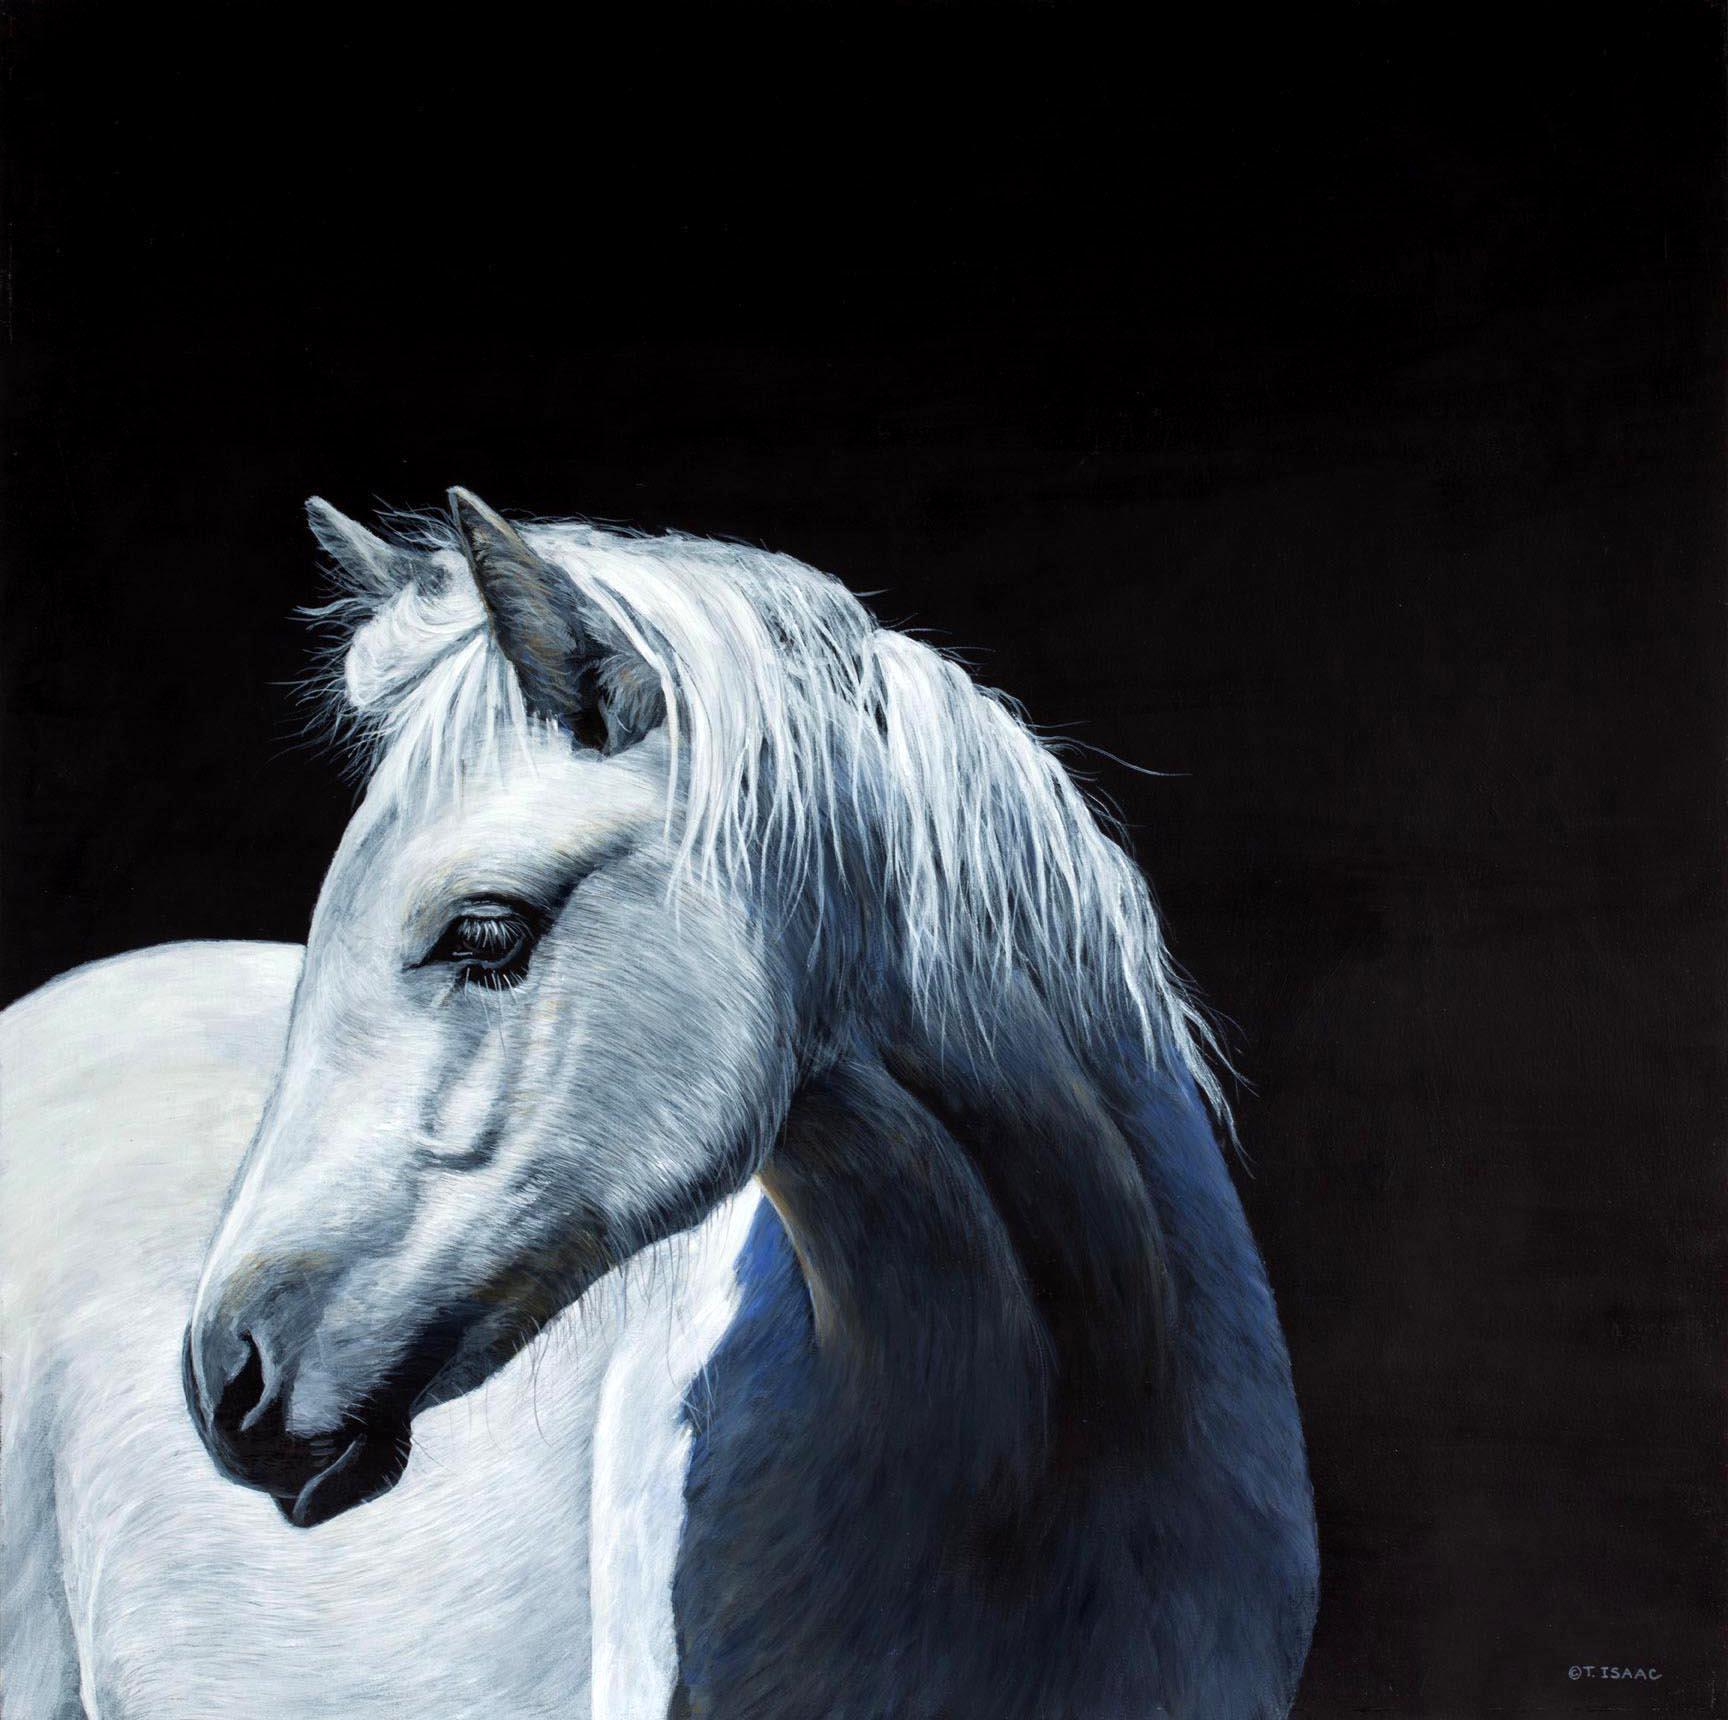 Serenity - Terry Isaac